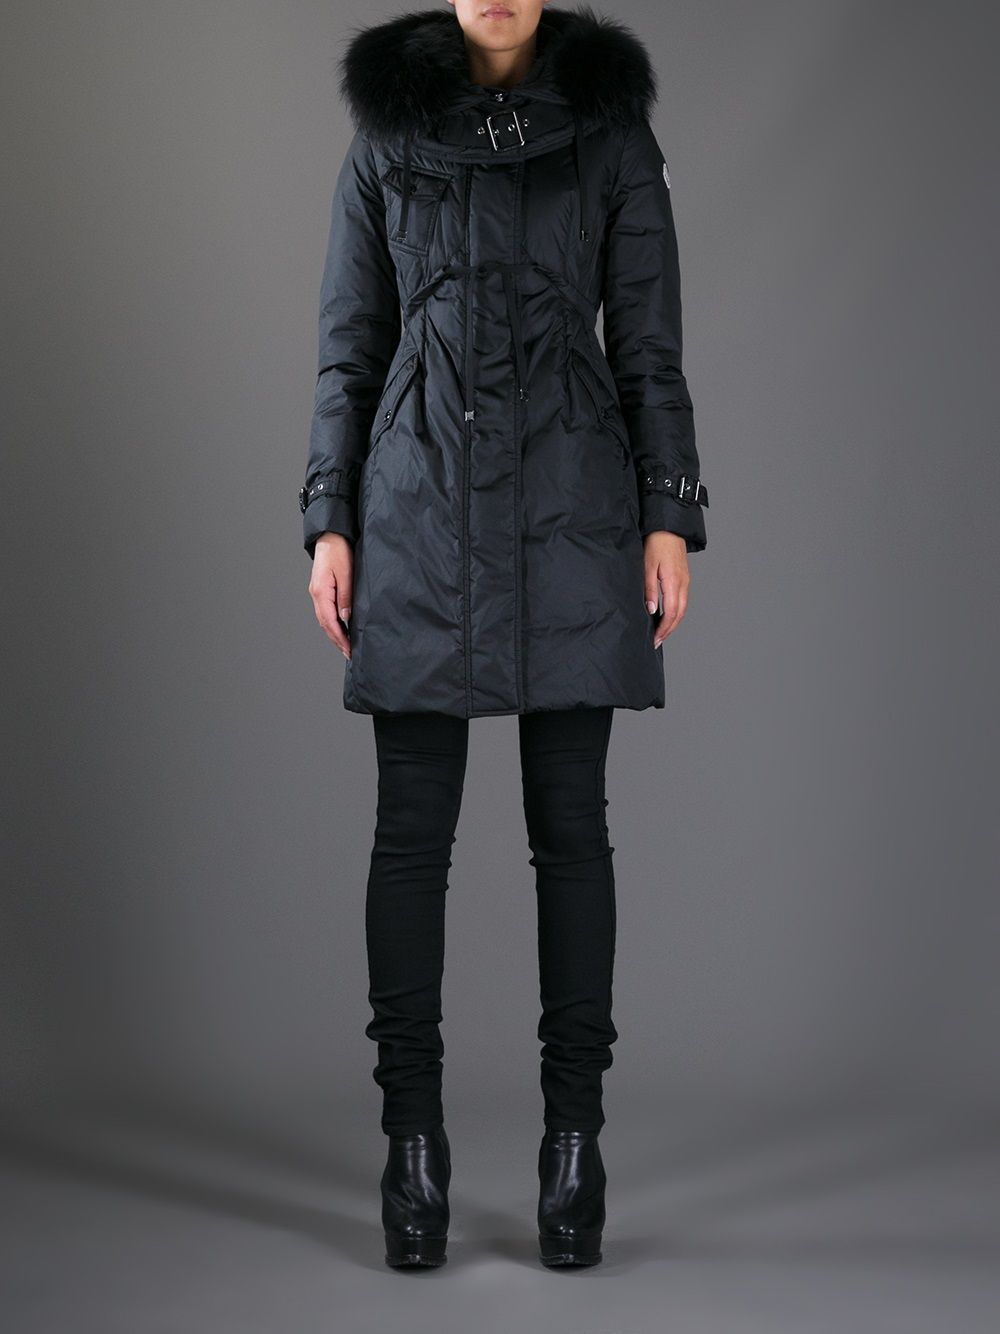 f529e467d france moncler phalangere fur trimmed coat hangers fb847 1351e